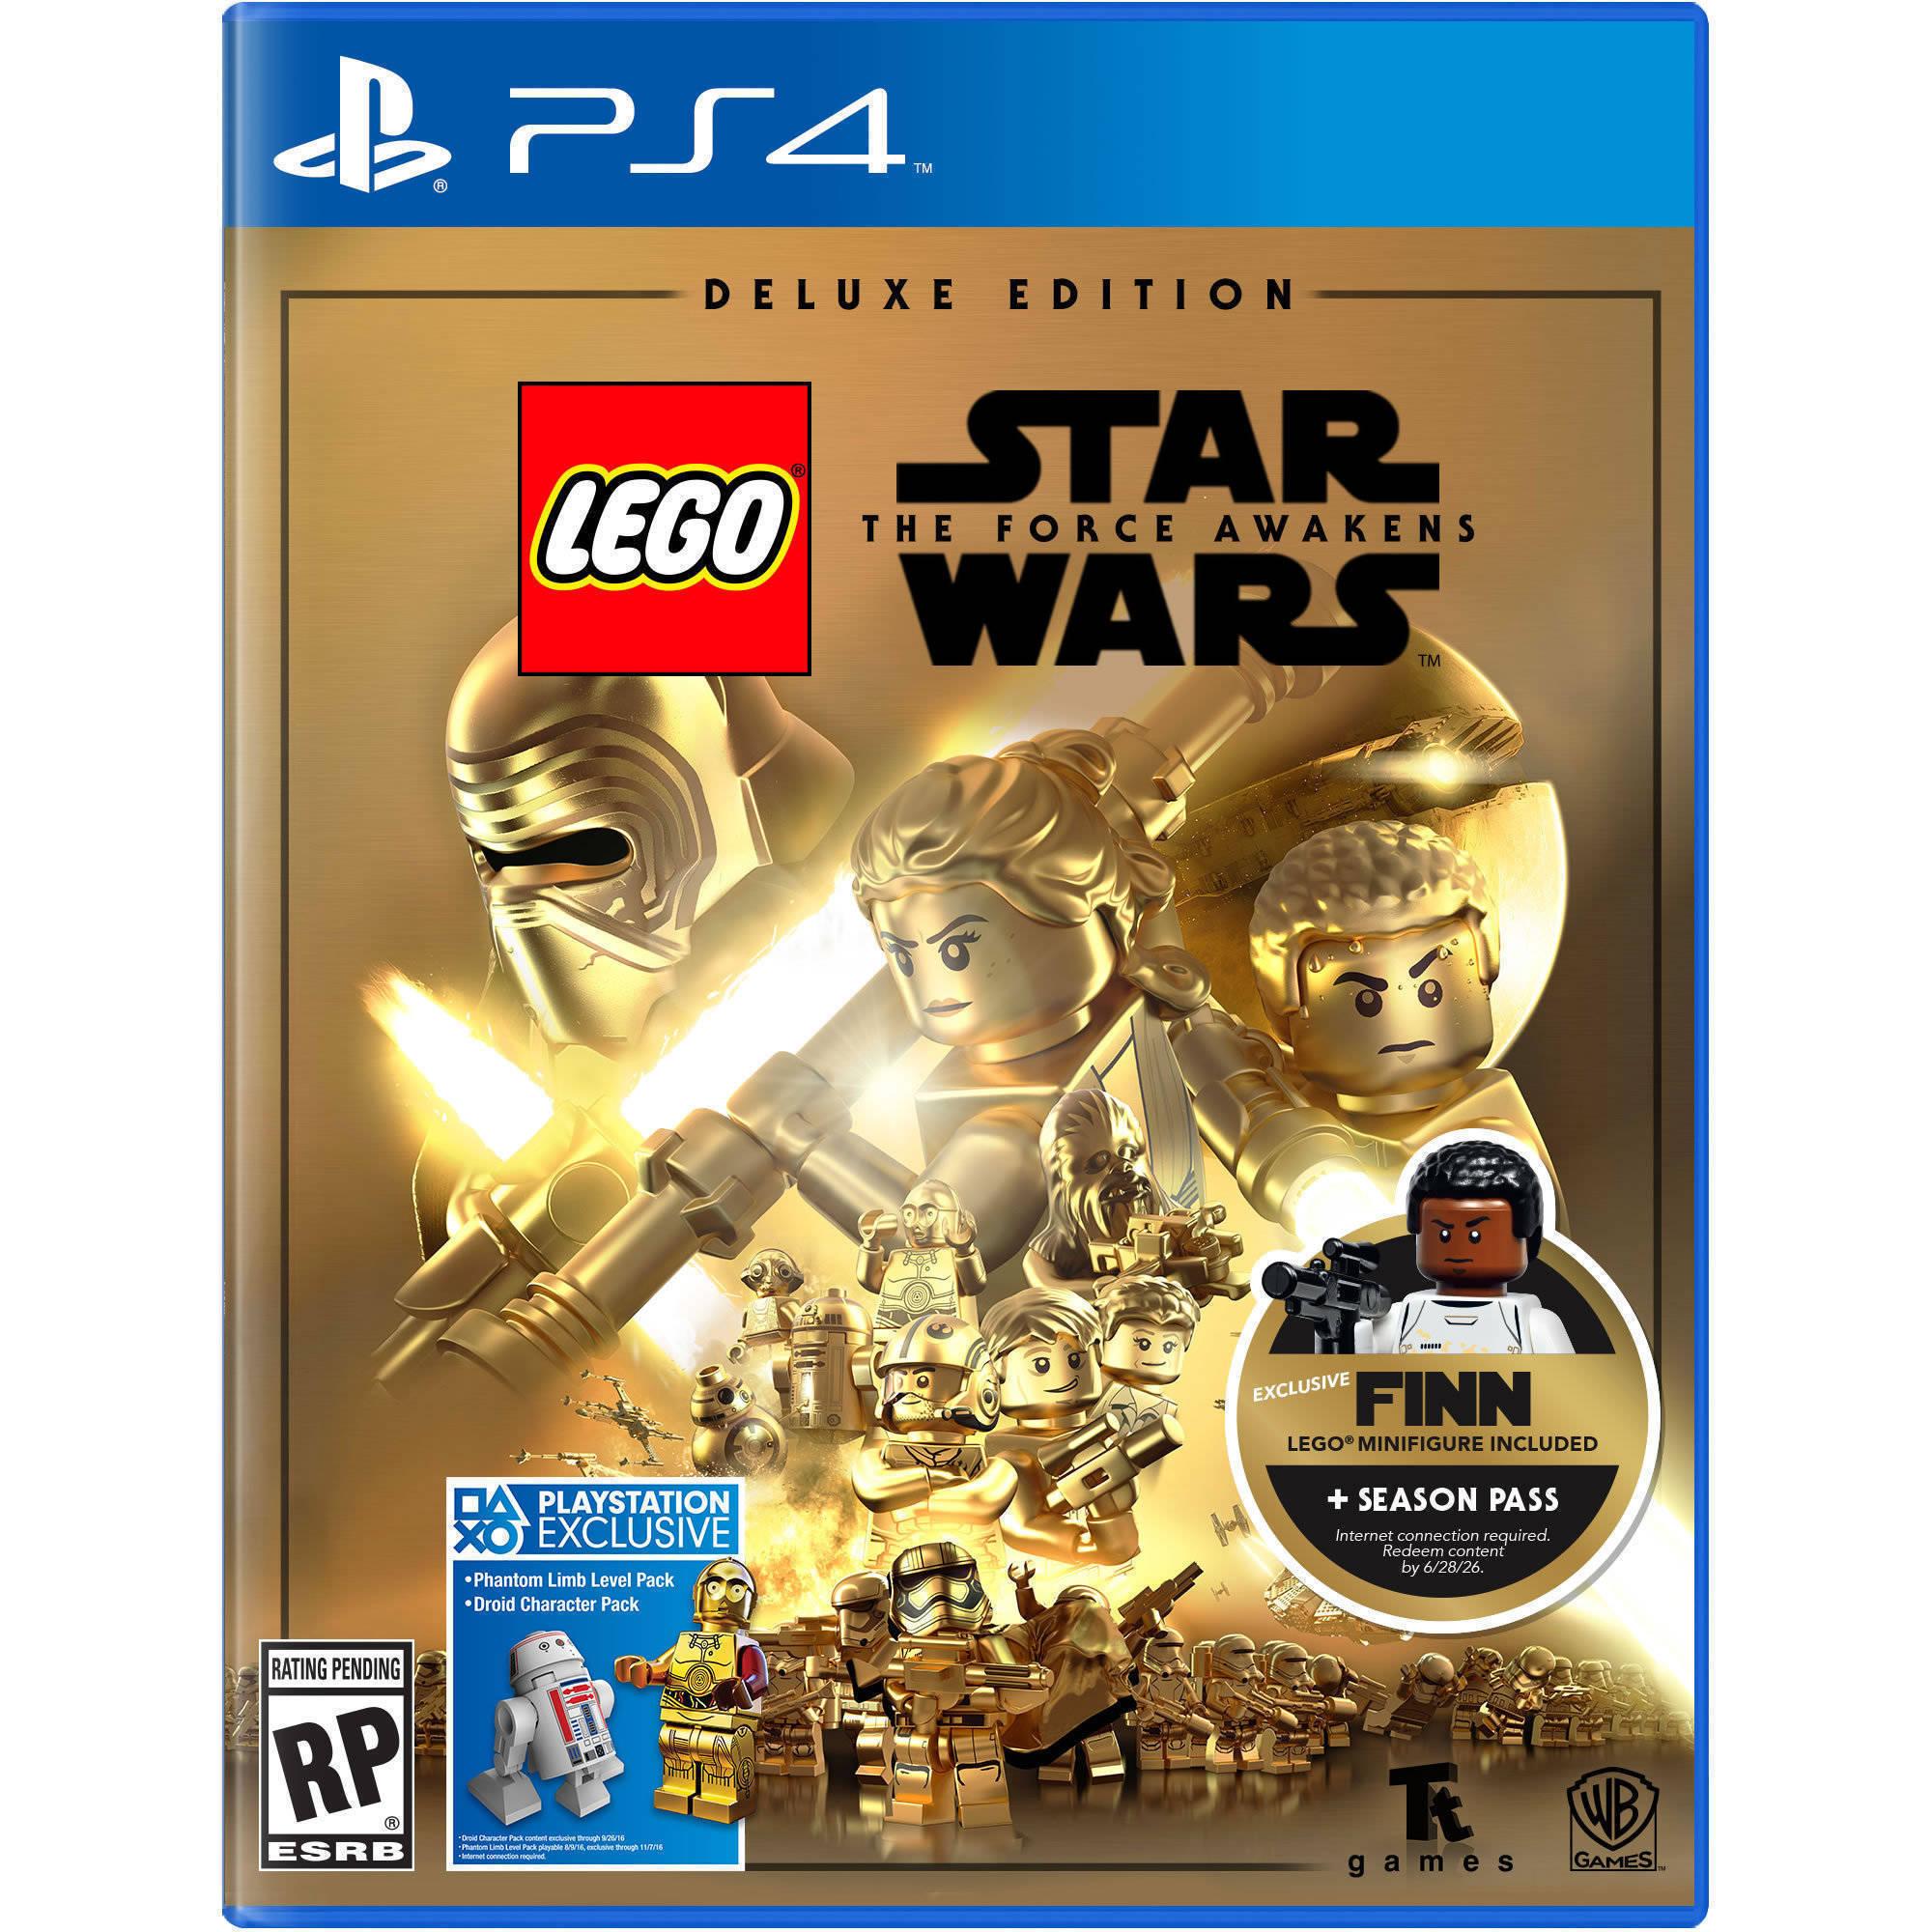 Warner Bros. Lego Star Wars Force Awakens Deluxe Edition (Playstation 4) Video Games by Warner Bros.